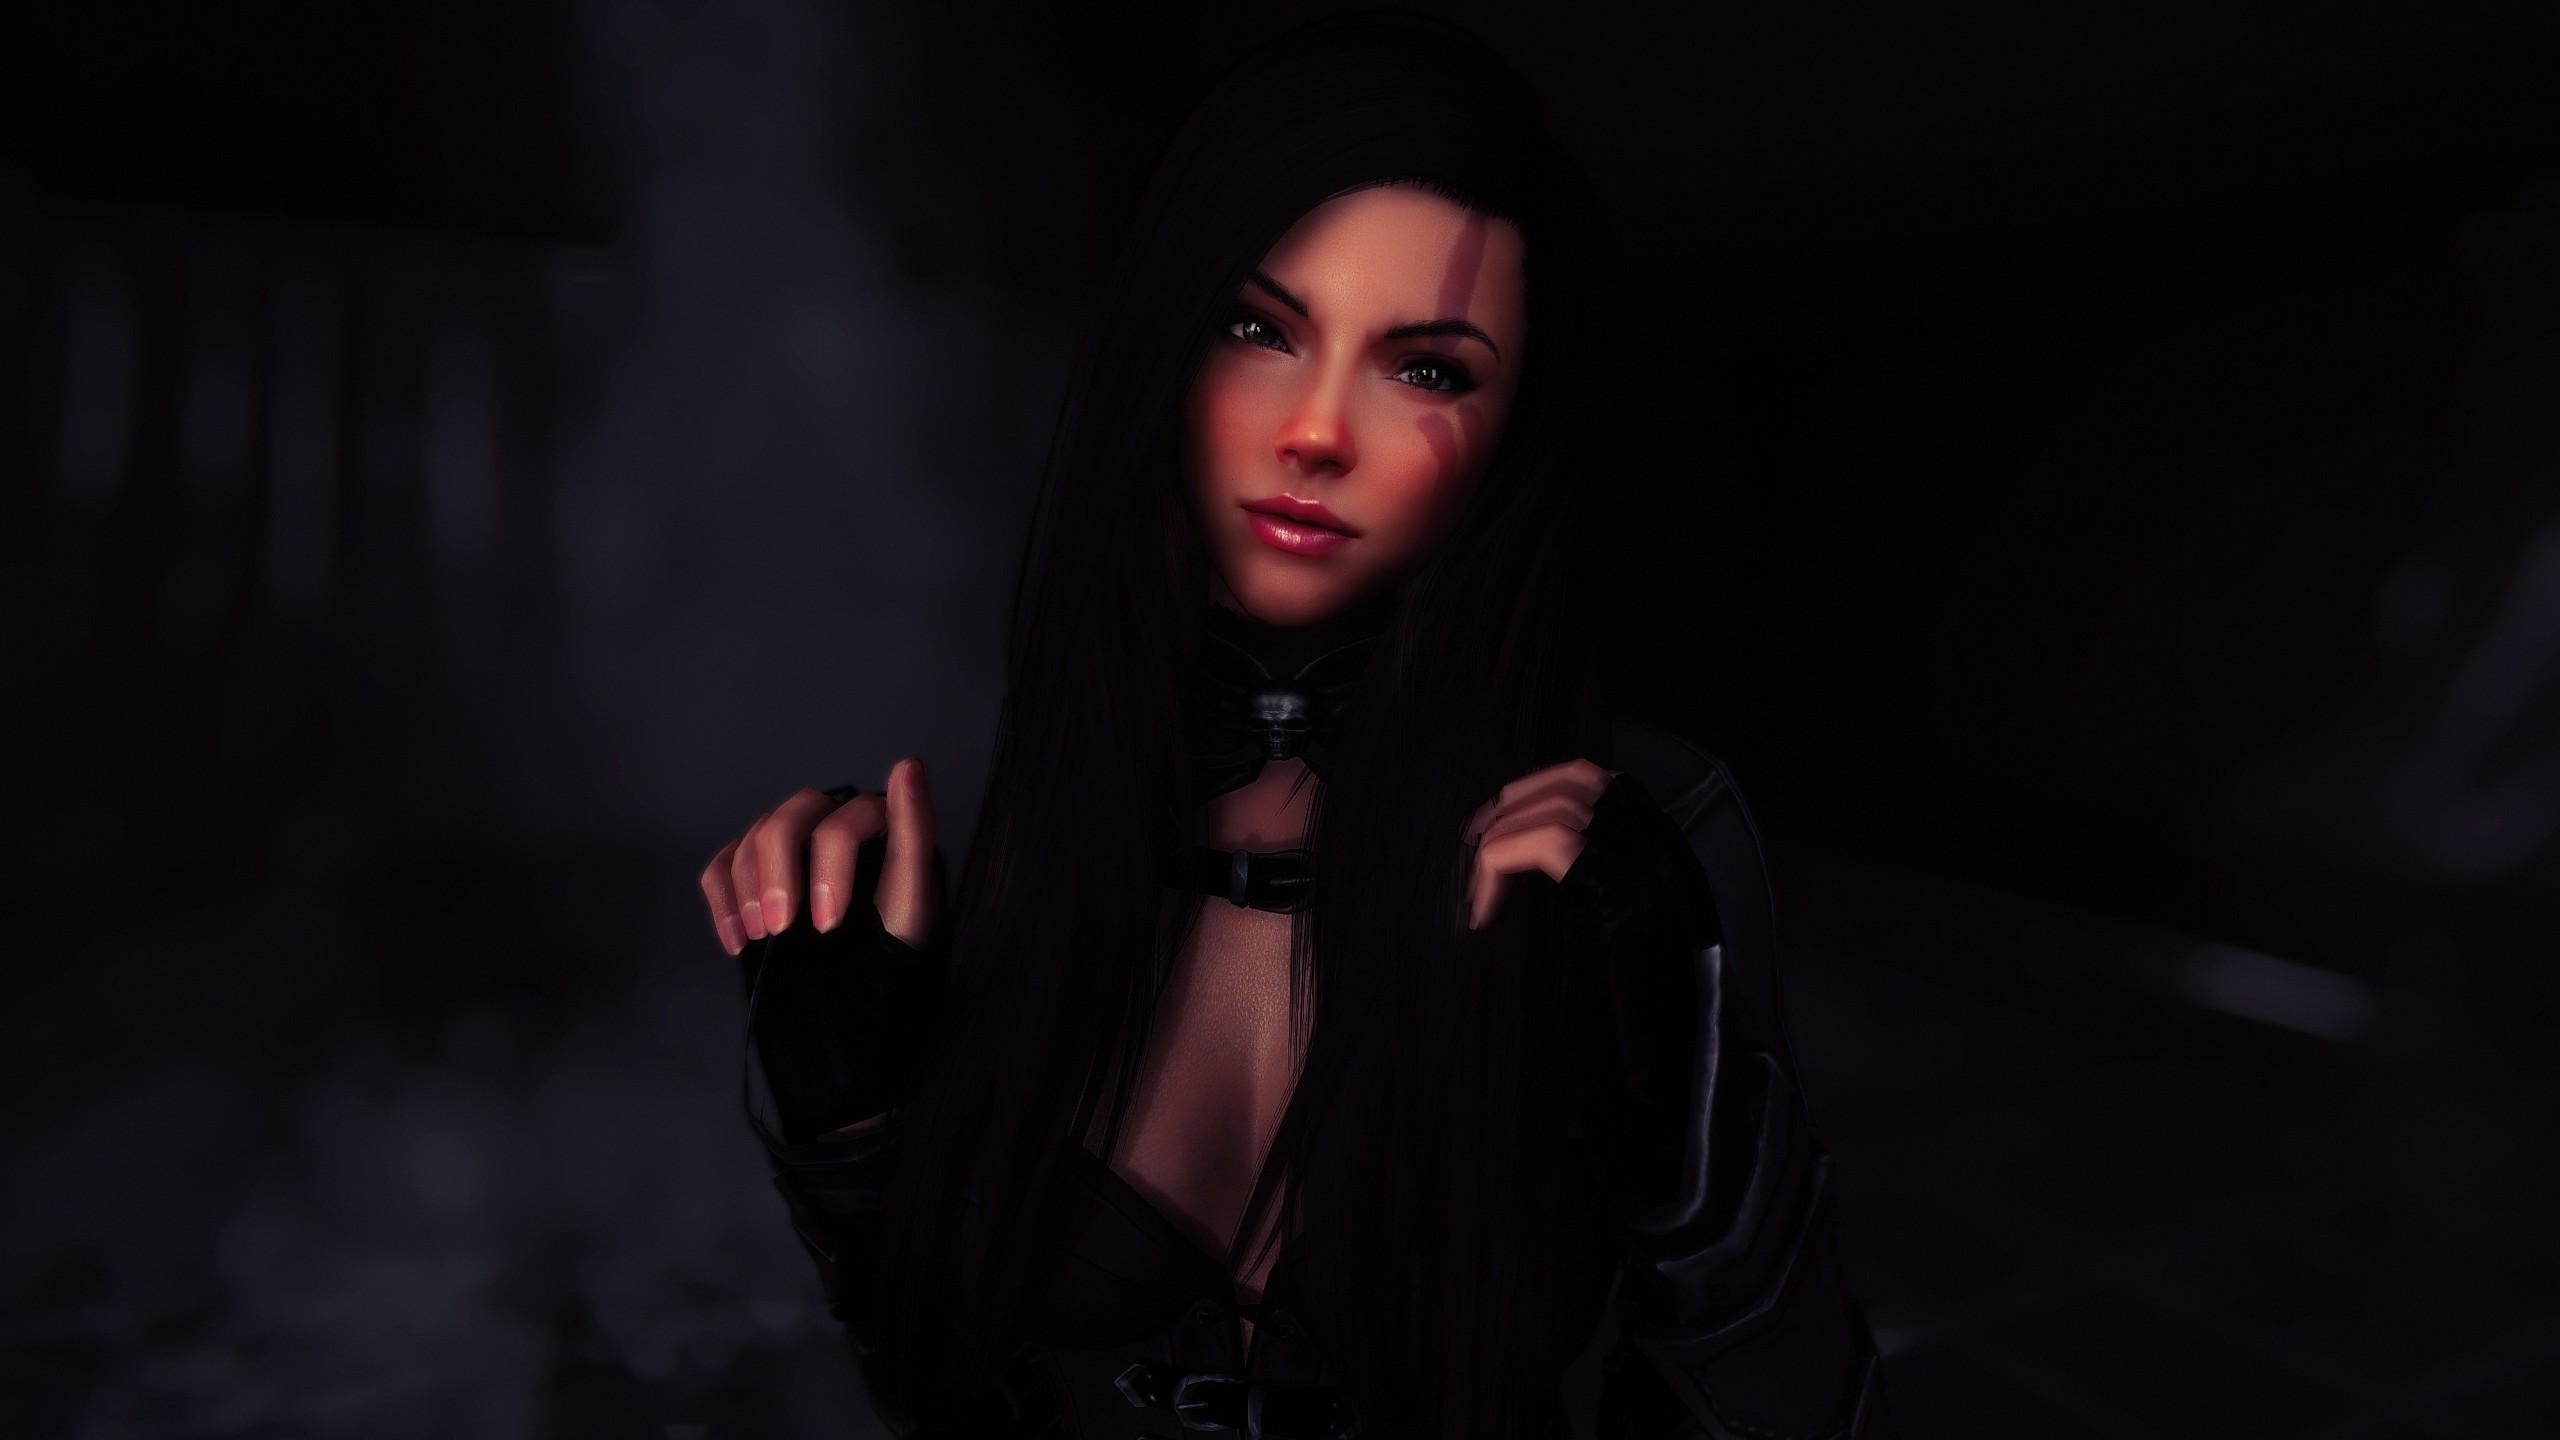 Caldo sexy nero video